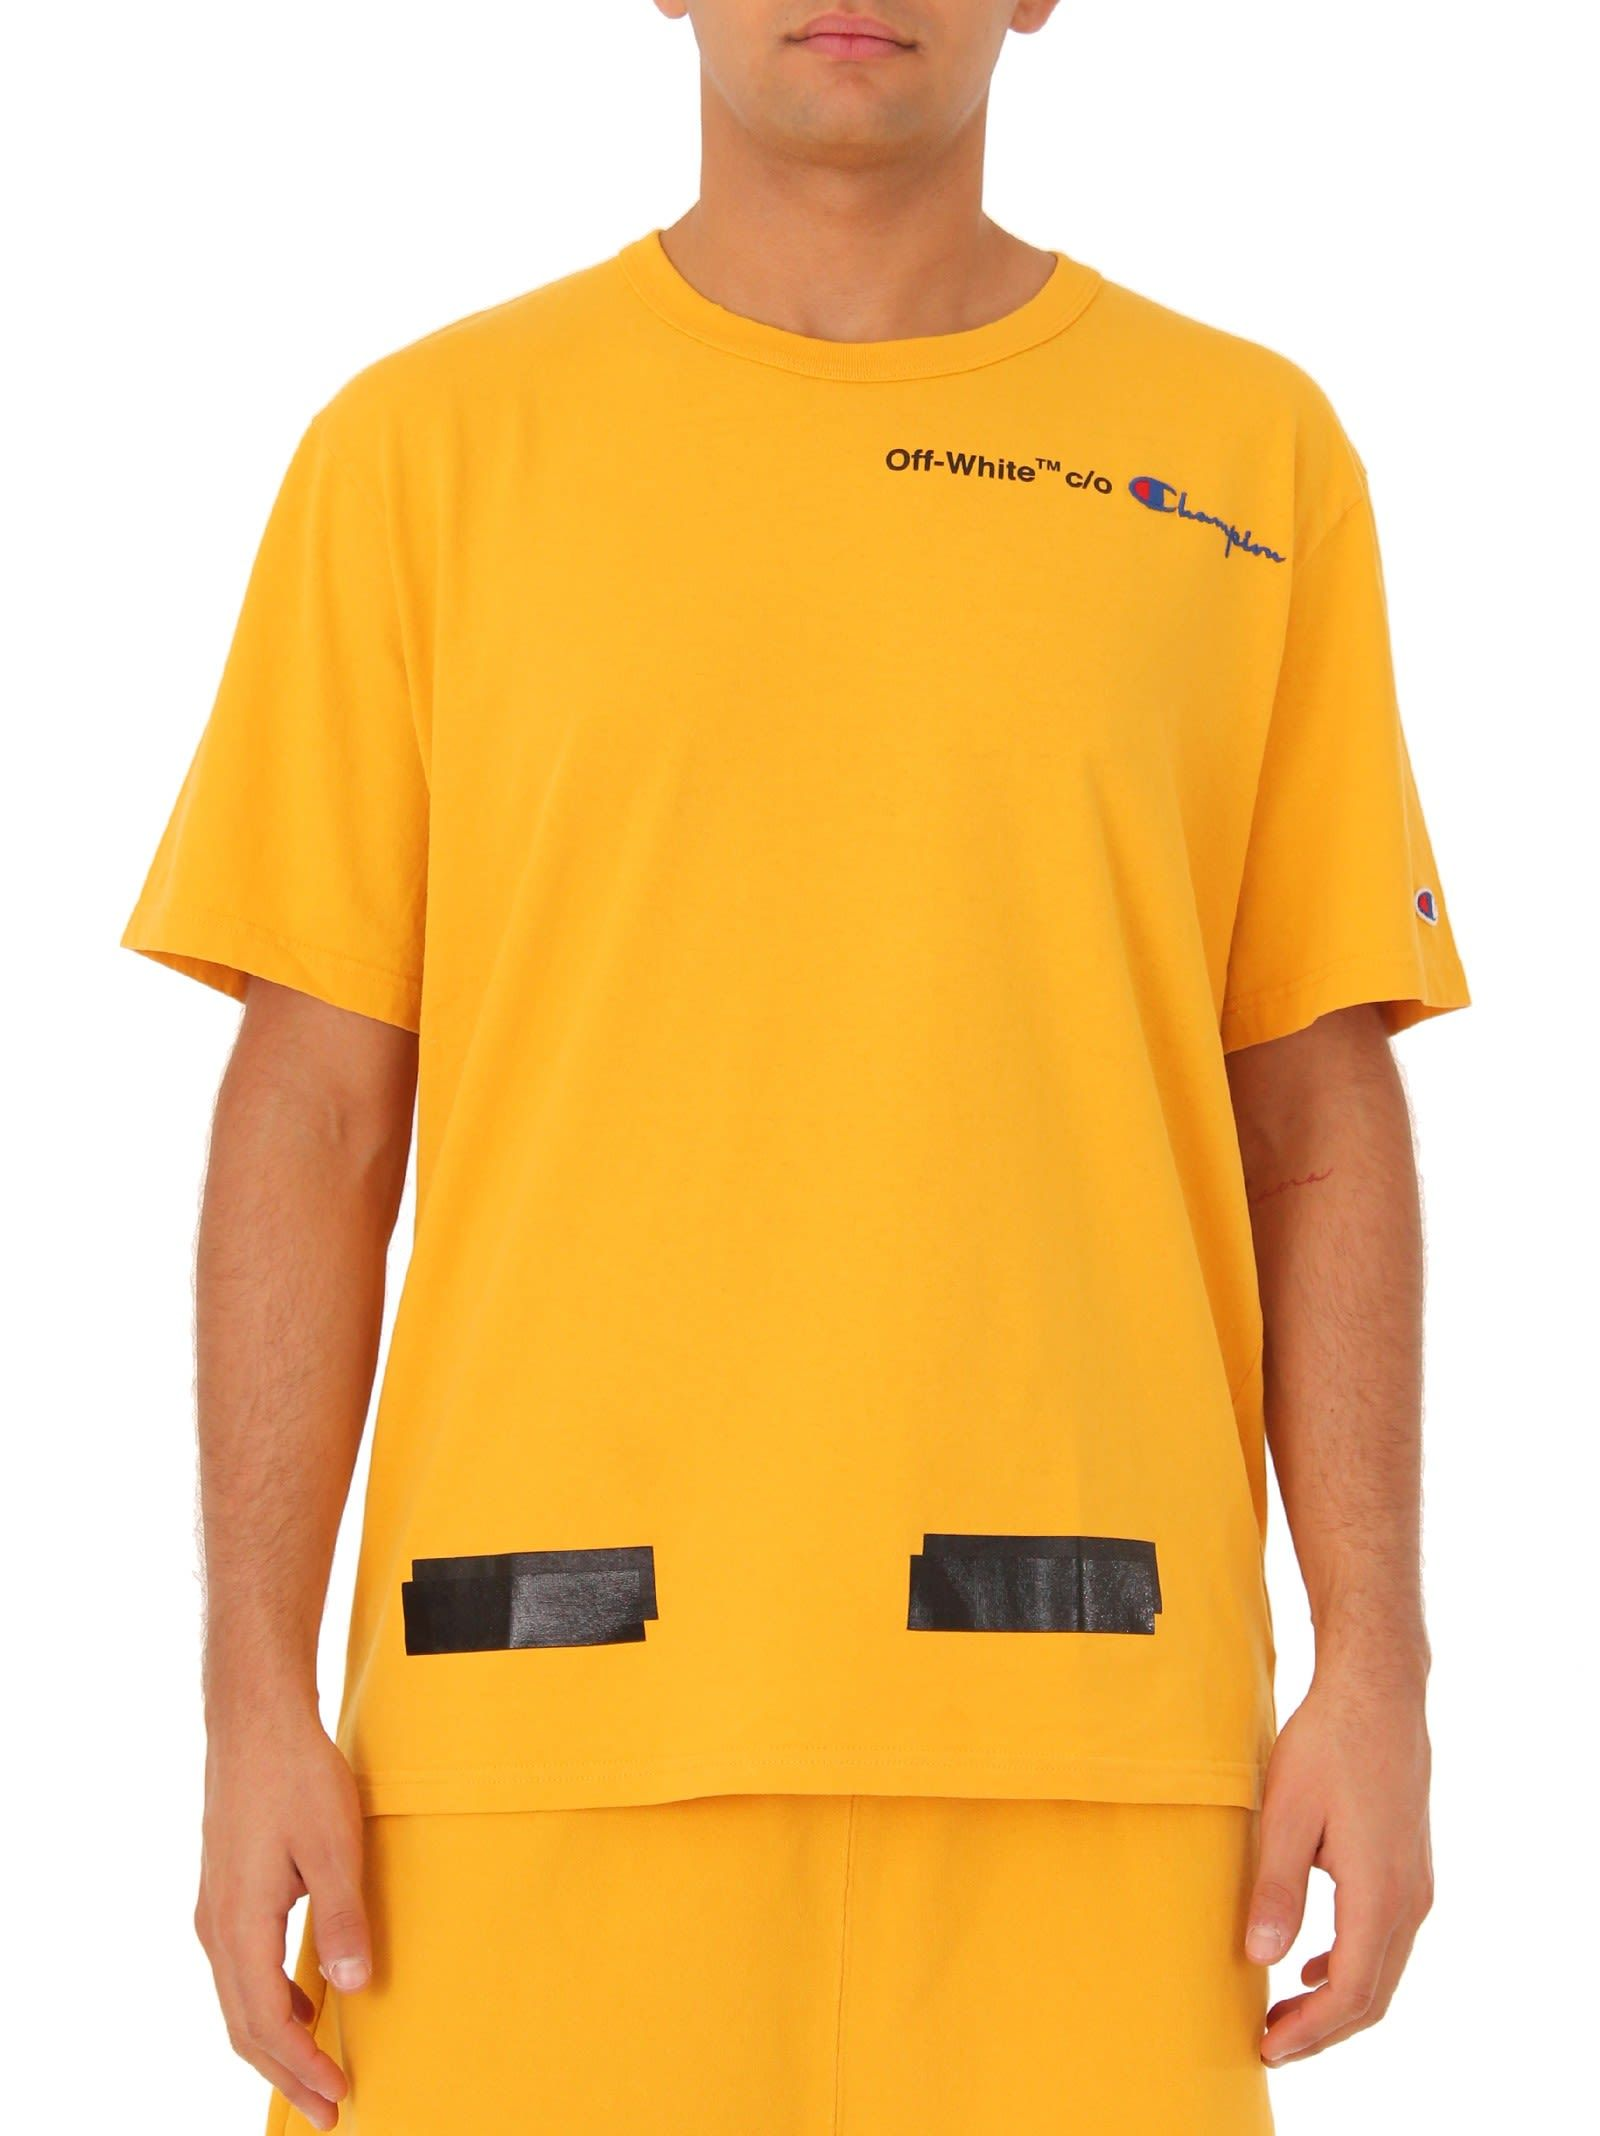 Off White Yellow Champion Reverse Weave Edition T Shirt Modesens Yellow T Shirt T Shirt Champion Reverse Weave